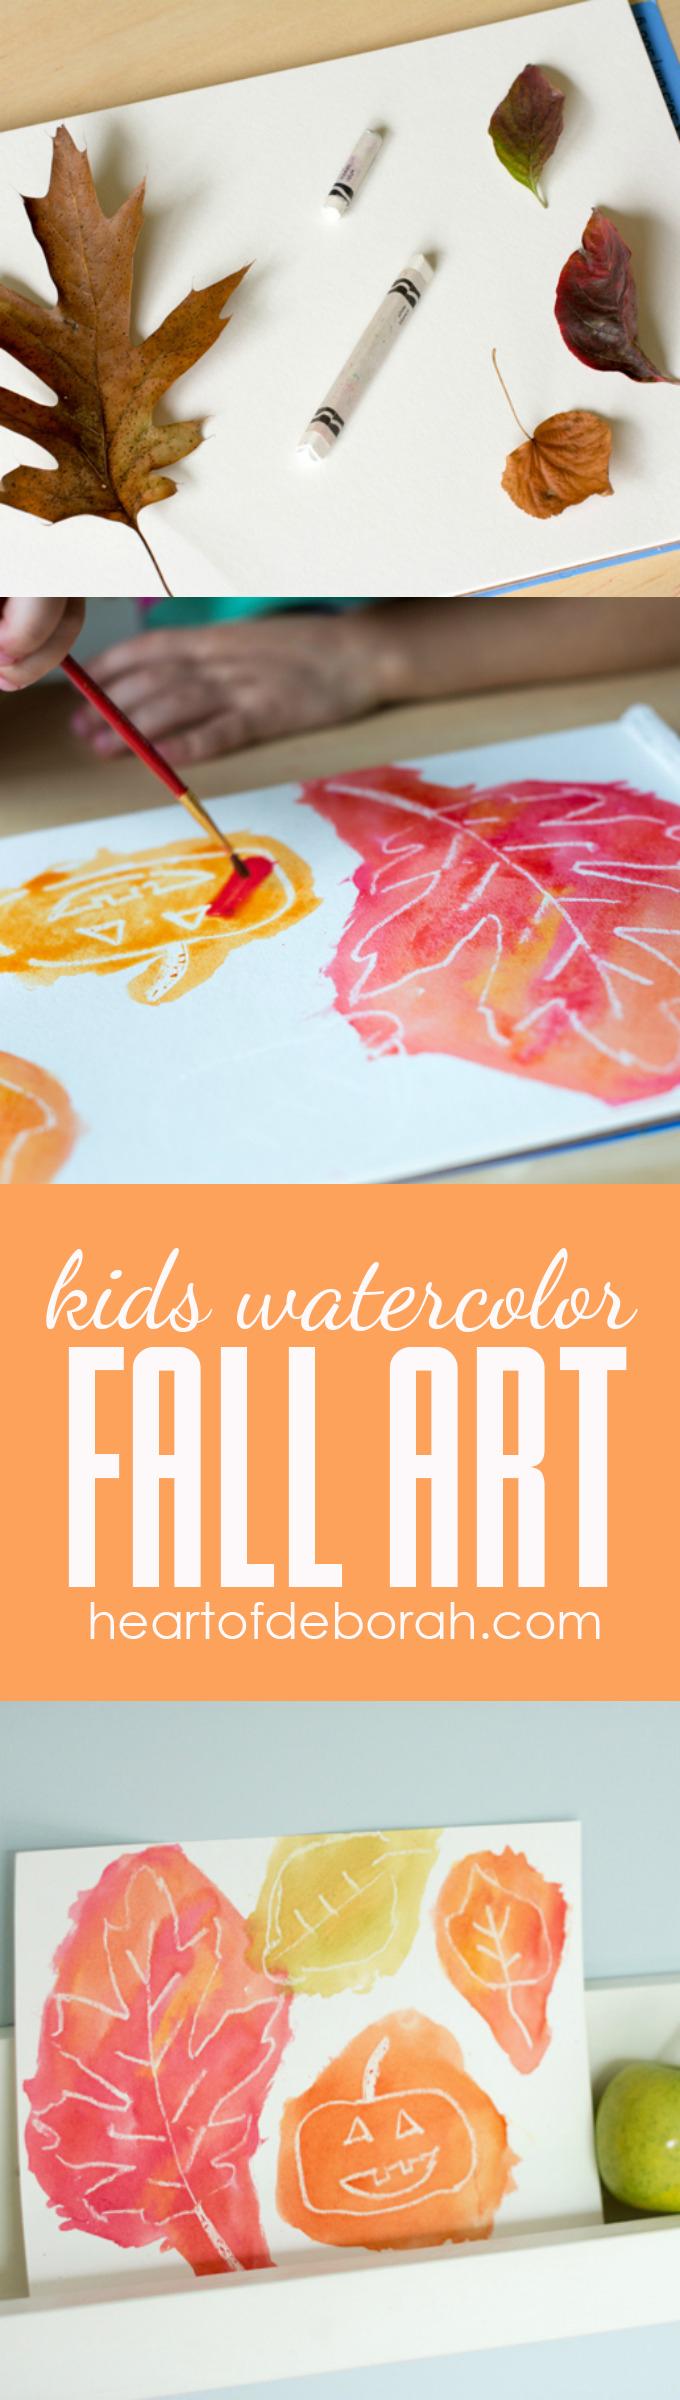 Kids Watercolor White Crayon Resist Fall Art for Kids